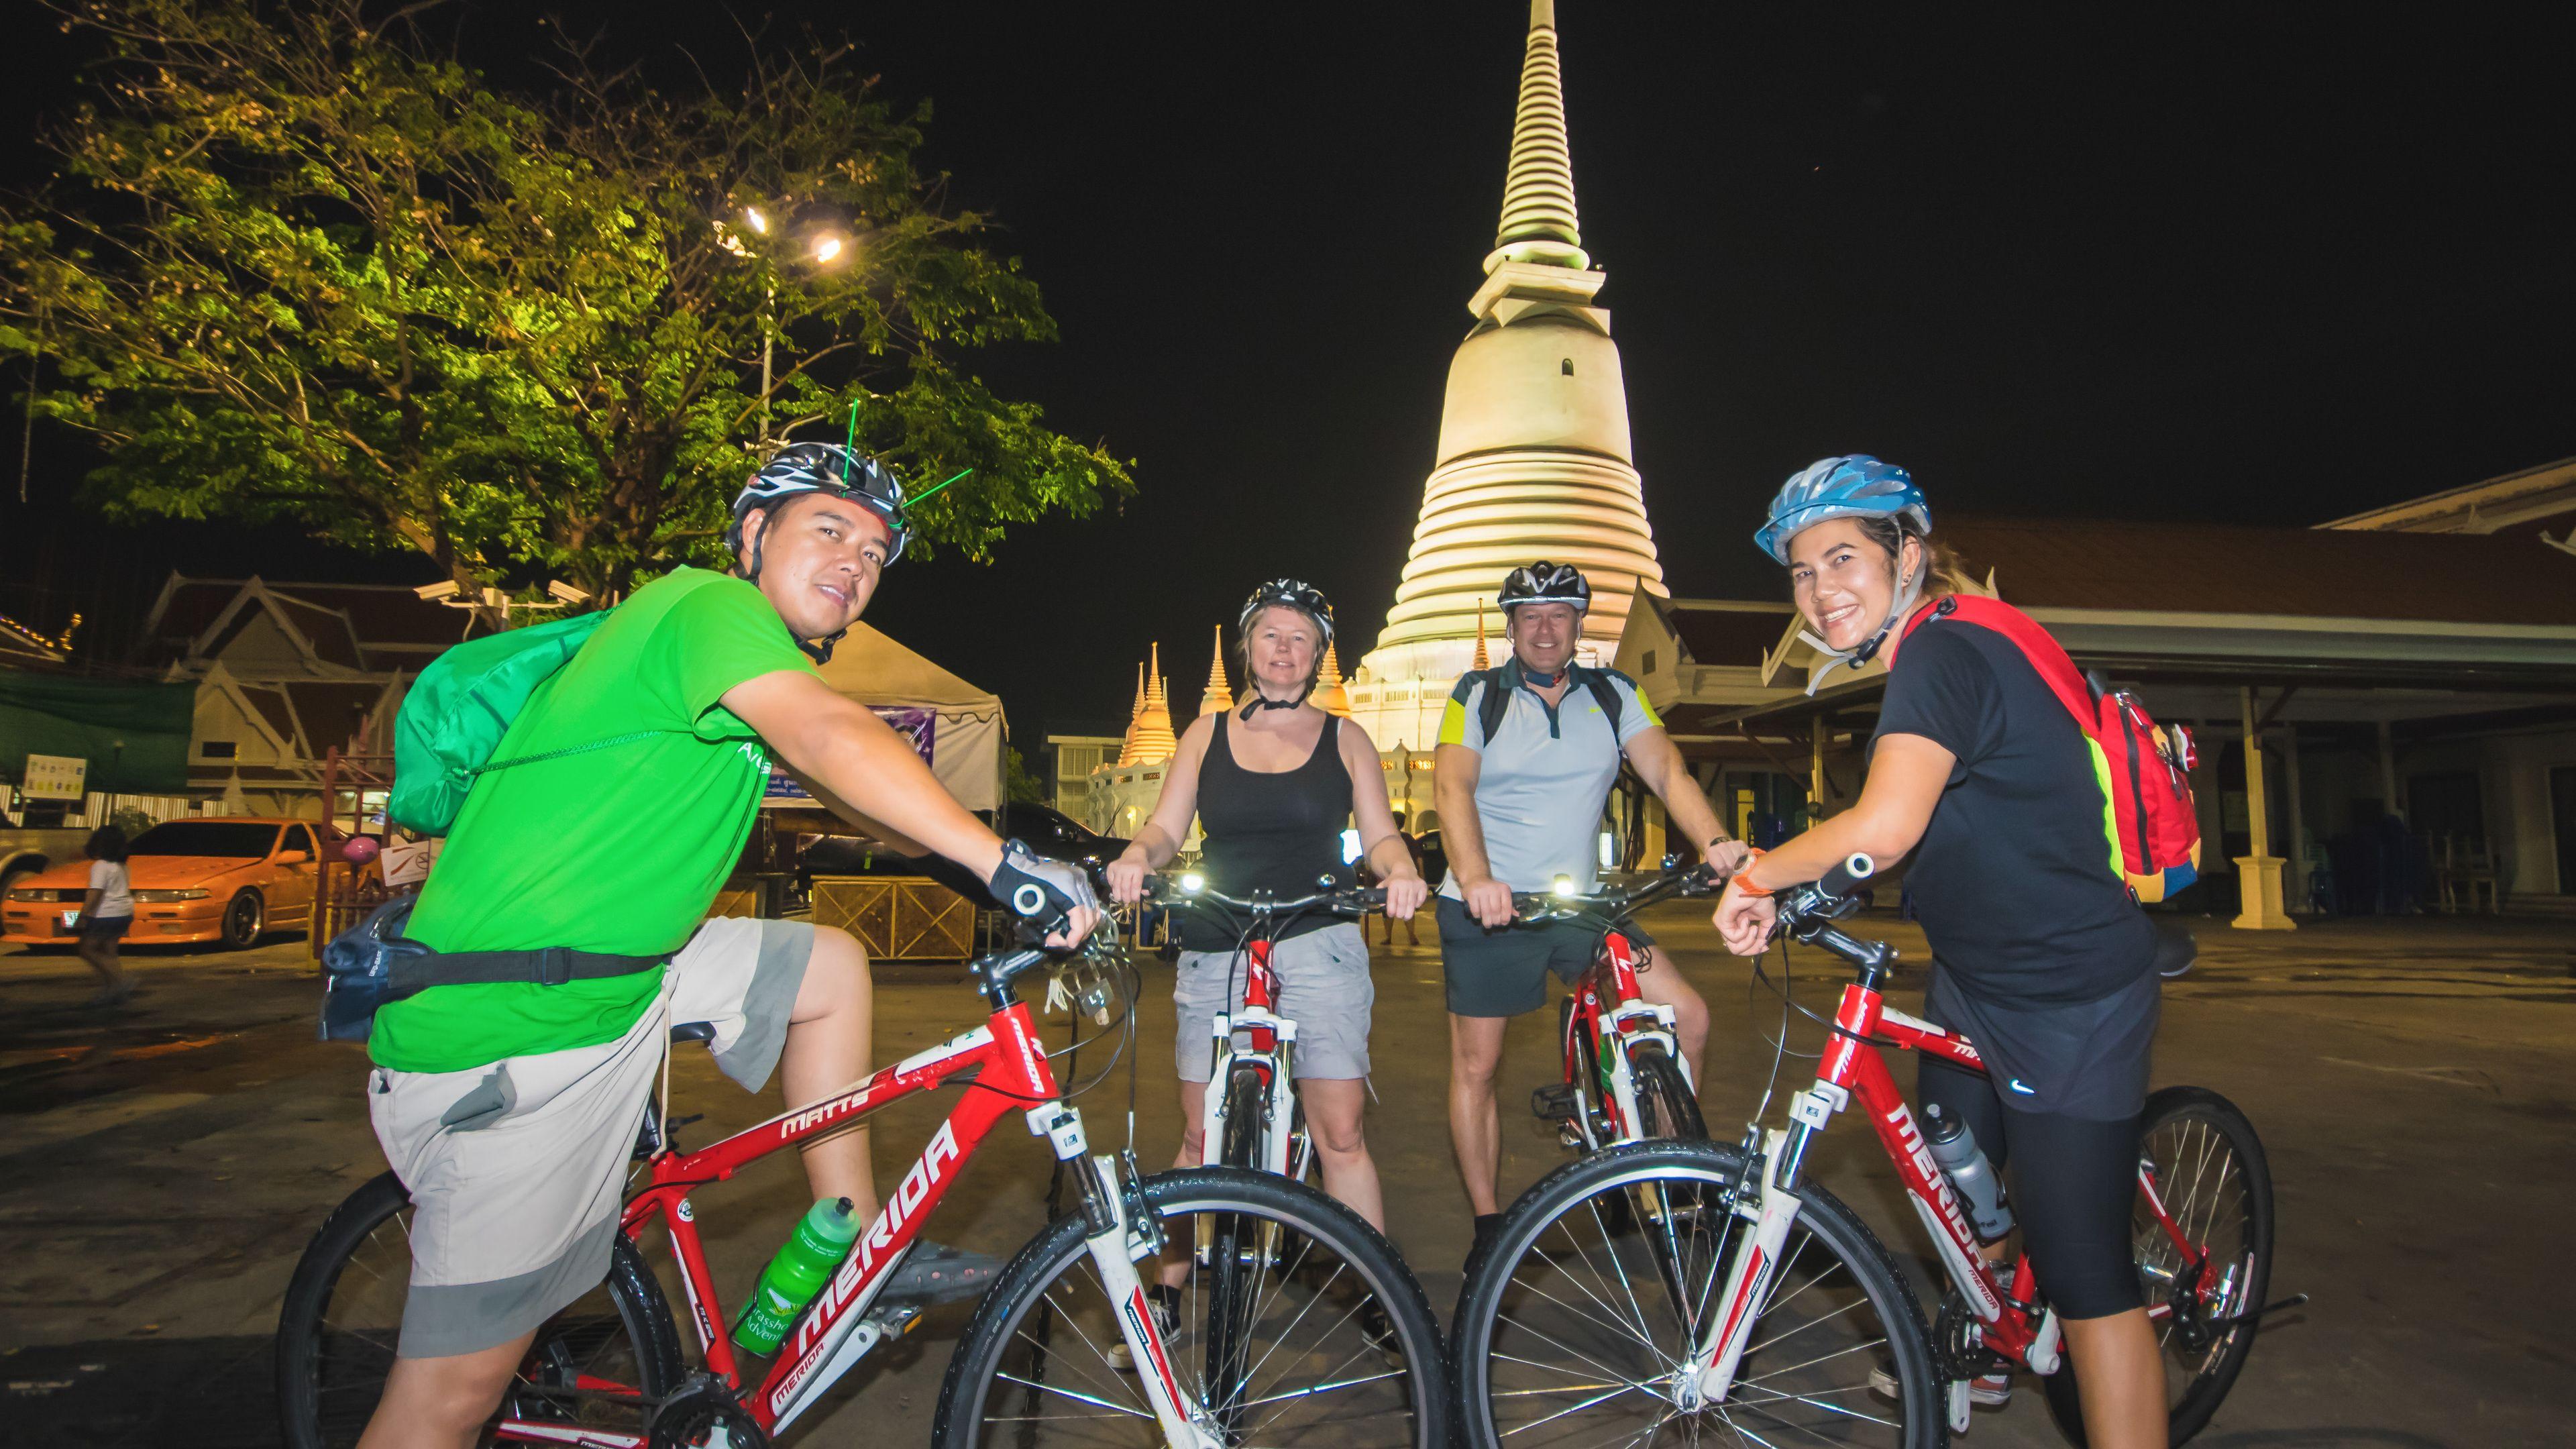 Evening Bike Tour with Night Markets & Street Food Tastings